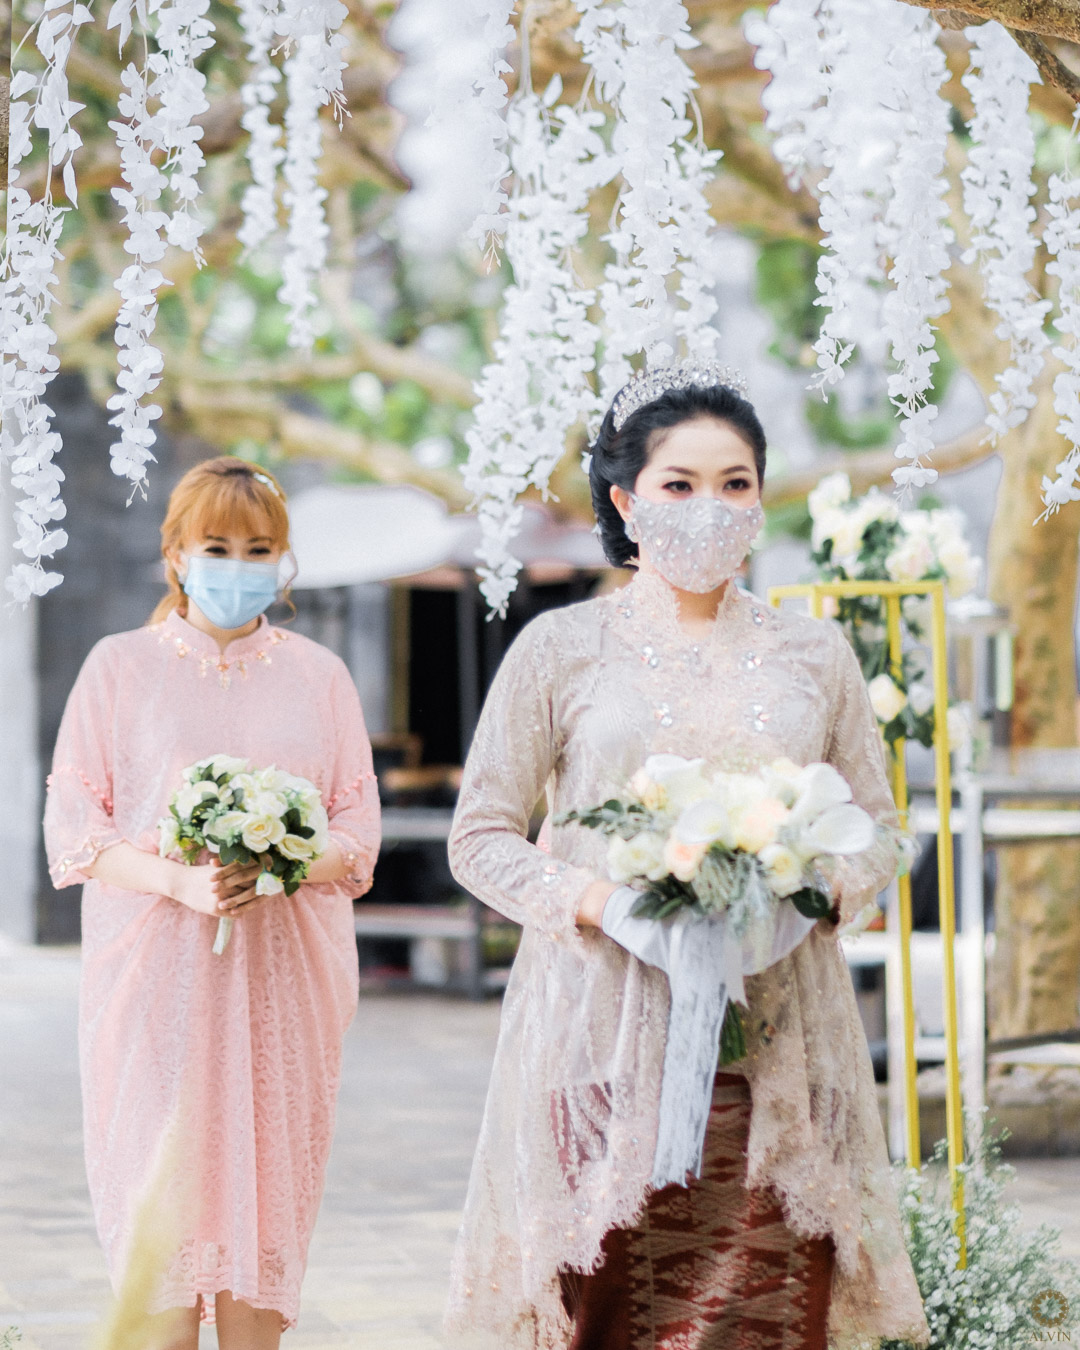 5 DSCF0222 : New Normal Wedding Ceremony